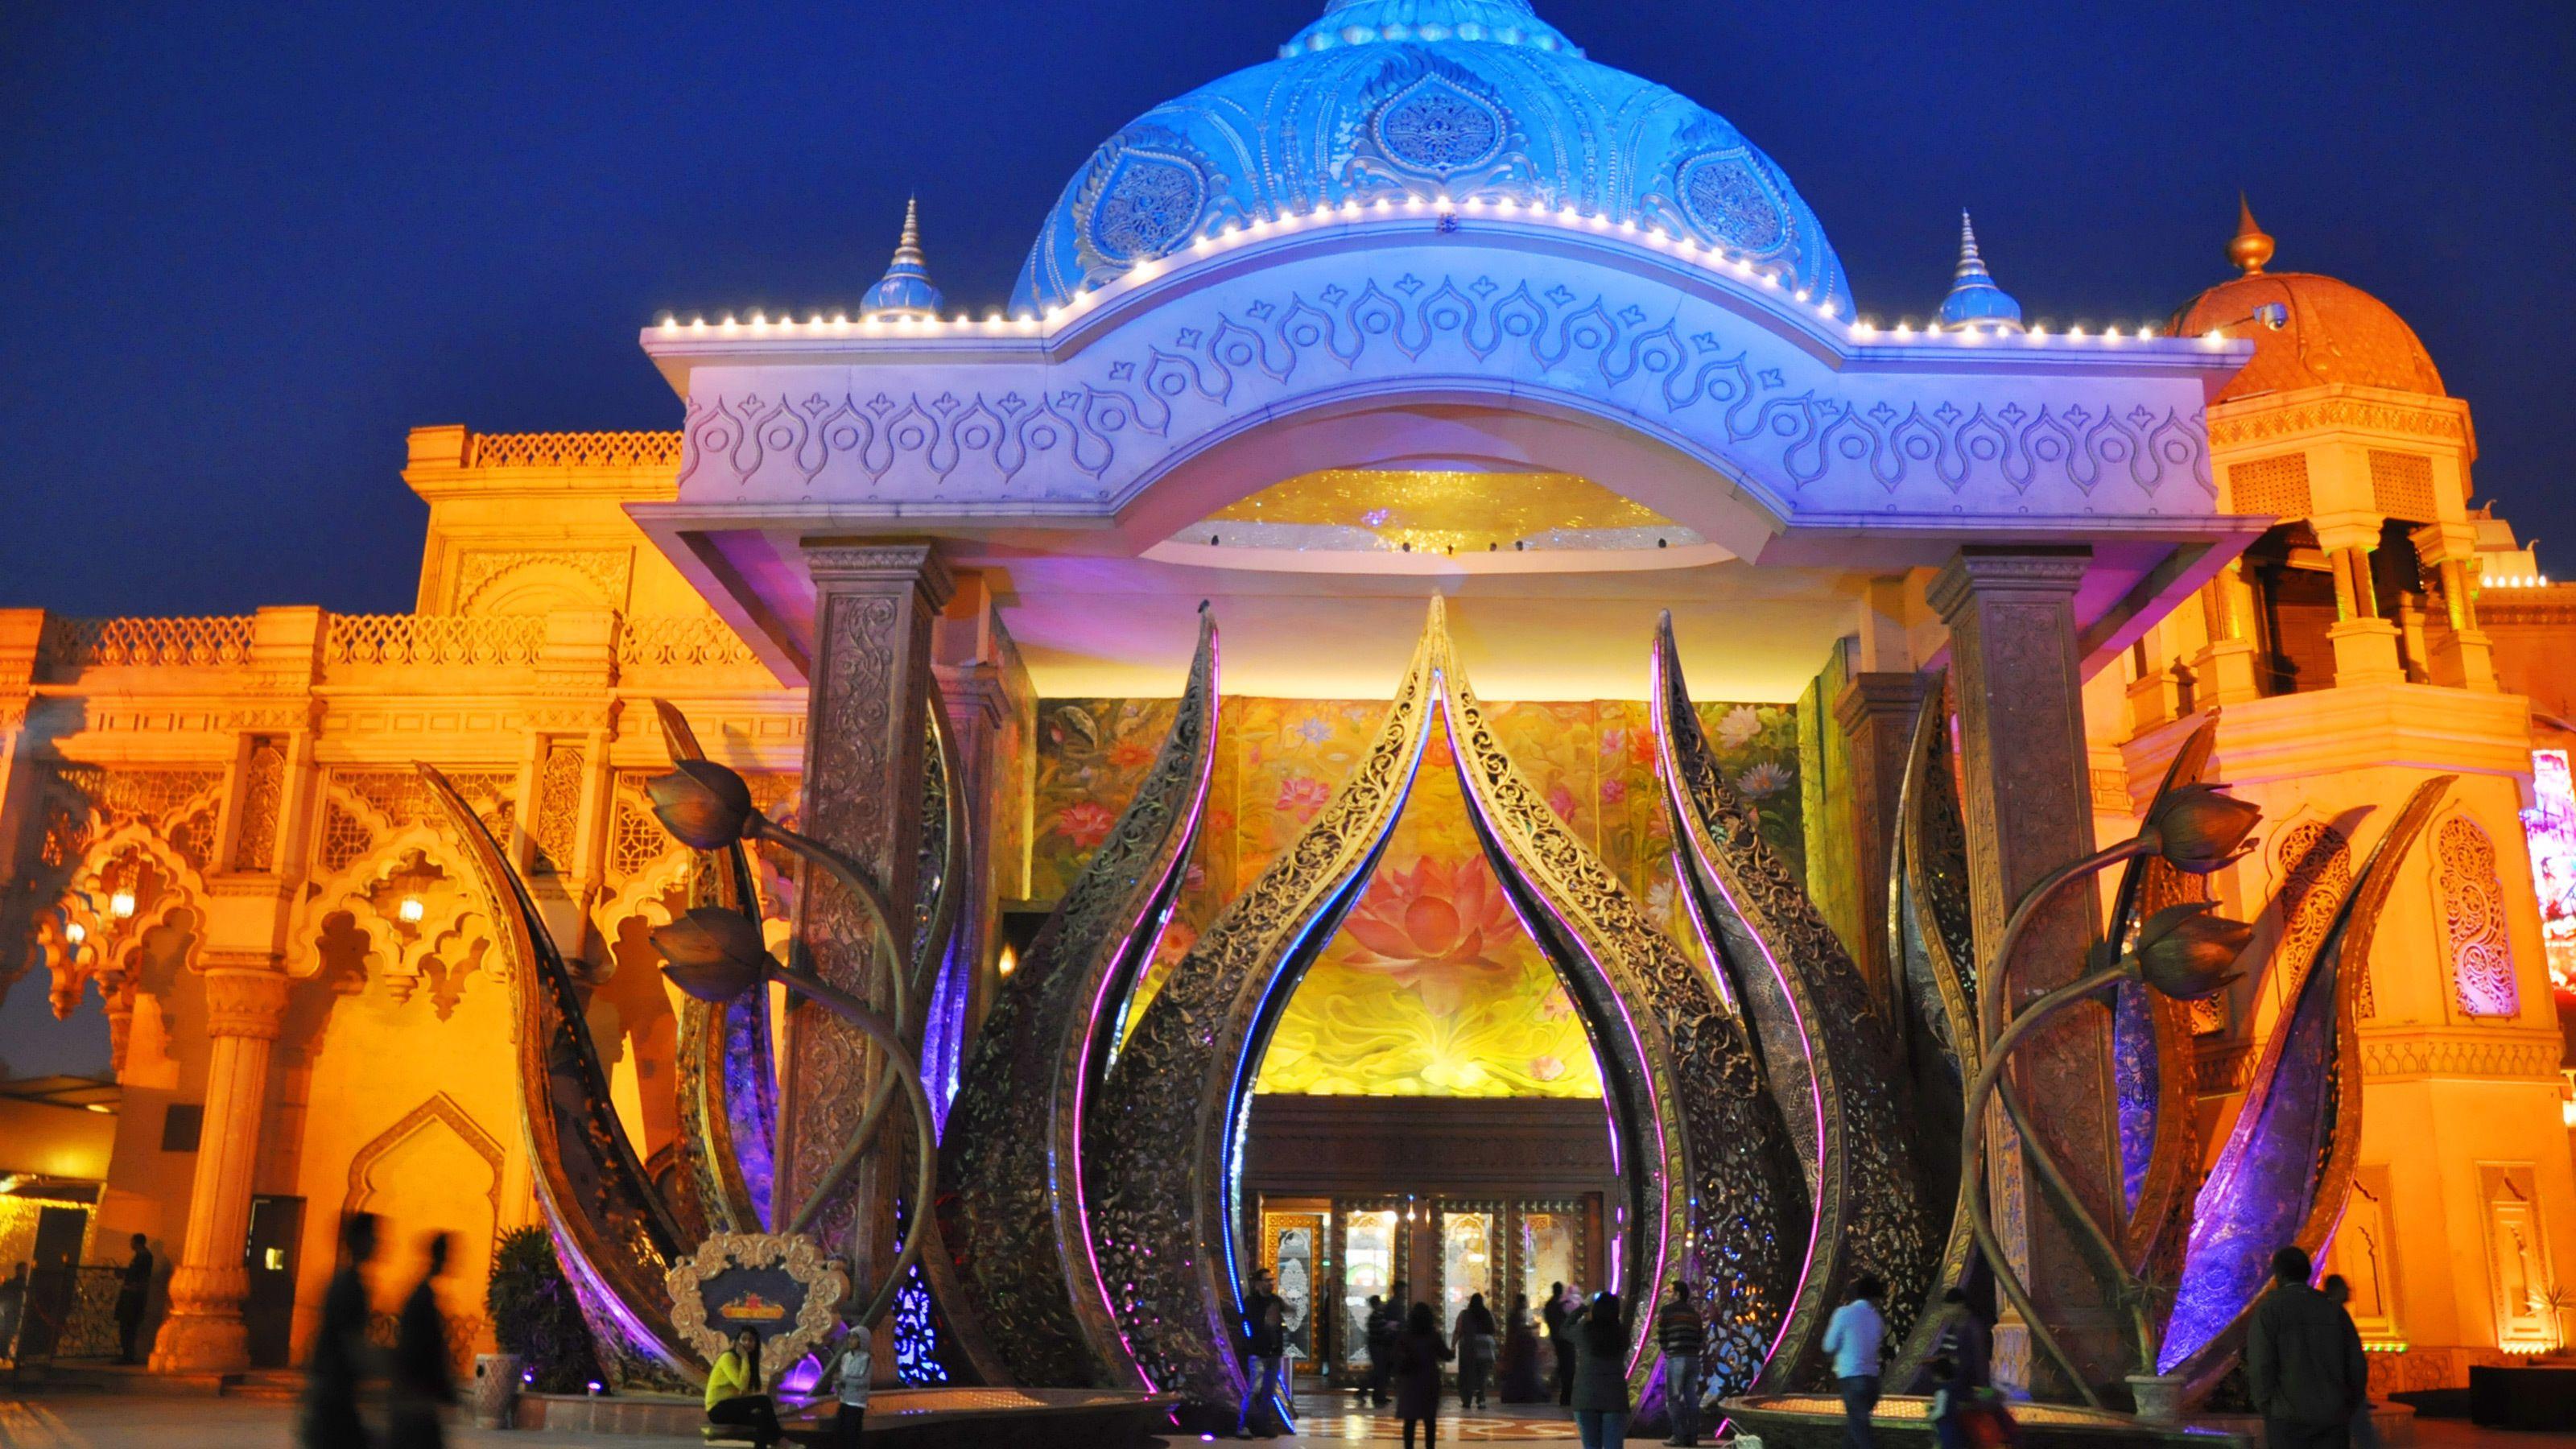 Exterior of the Kingdom of Dreams theater illuminated at night